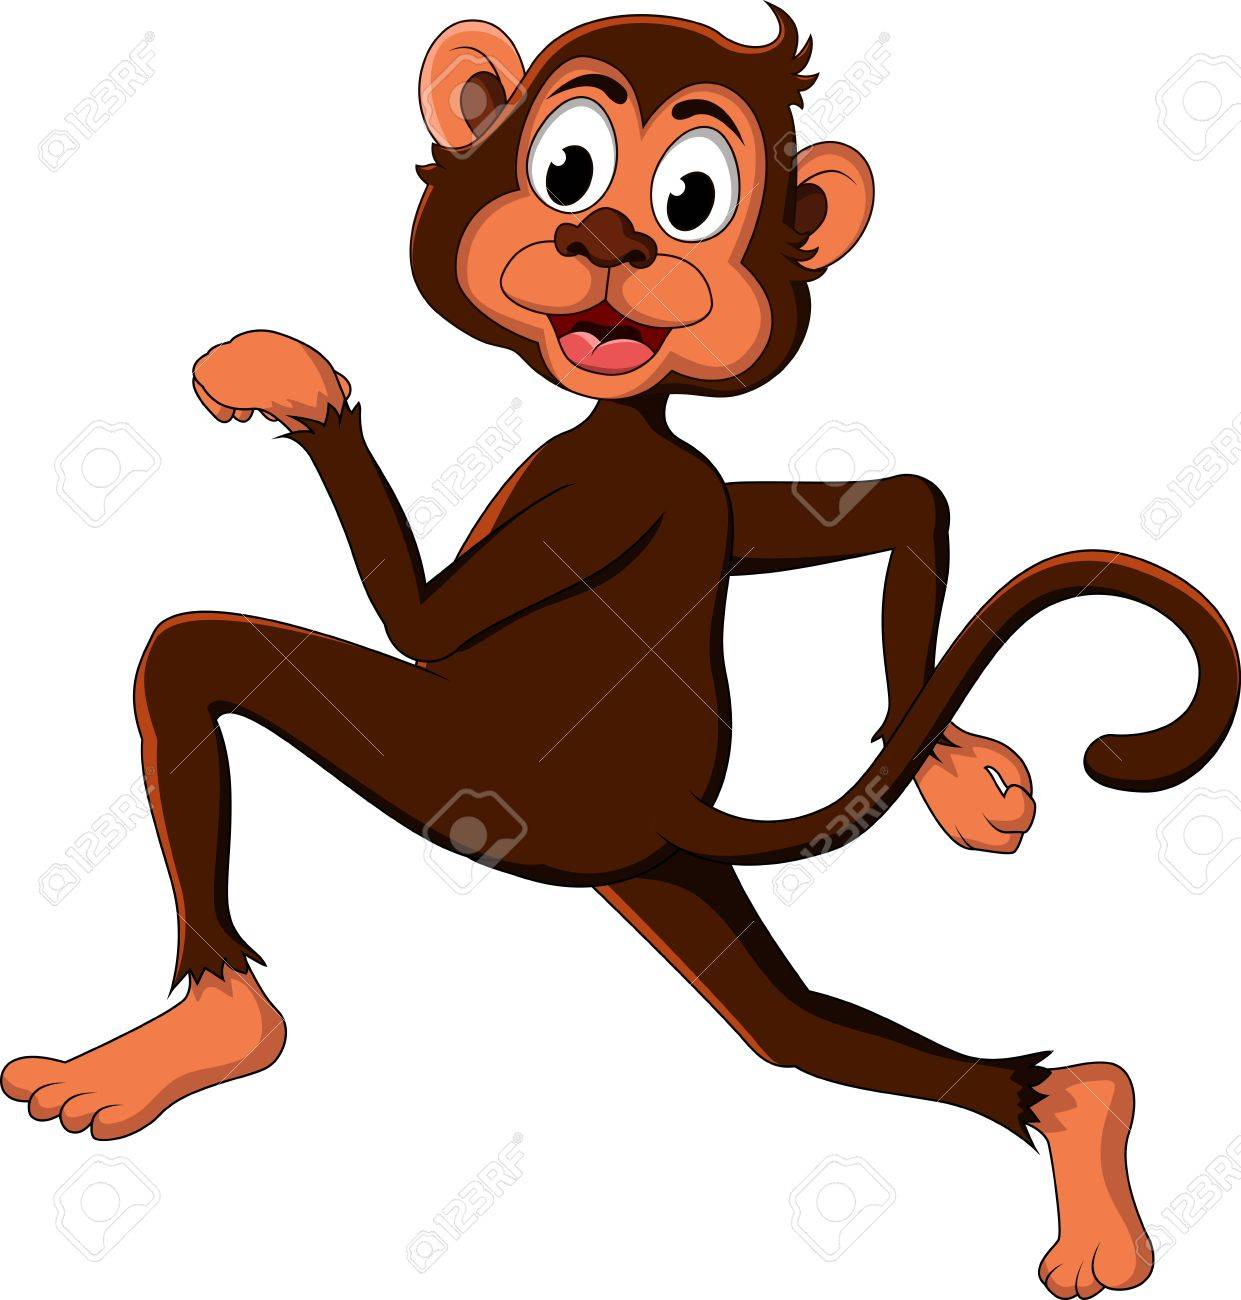 cute monkey cartoon expression Stock Vector - 17840632